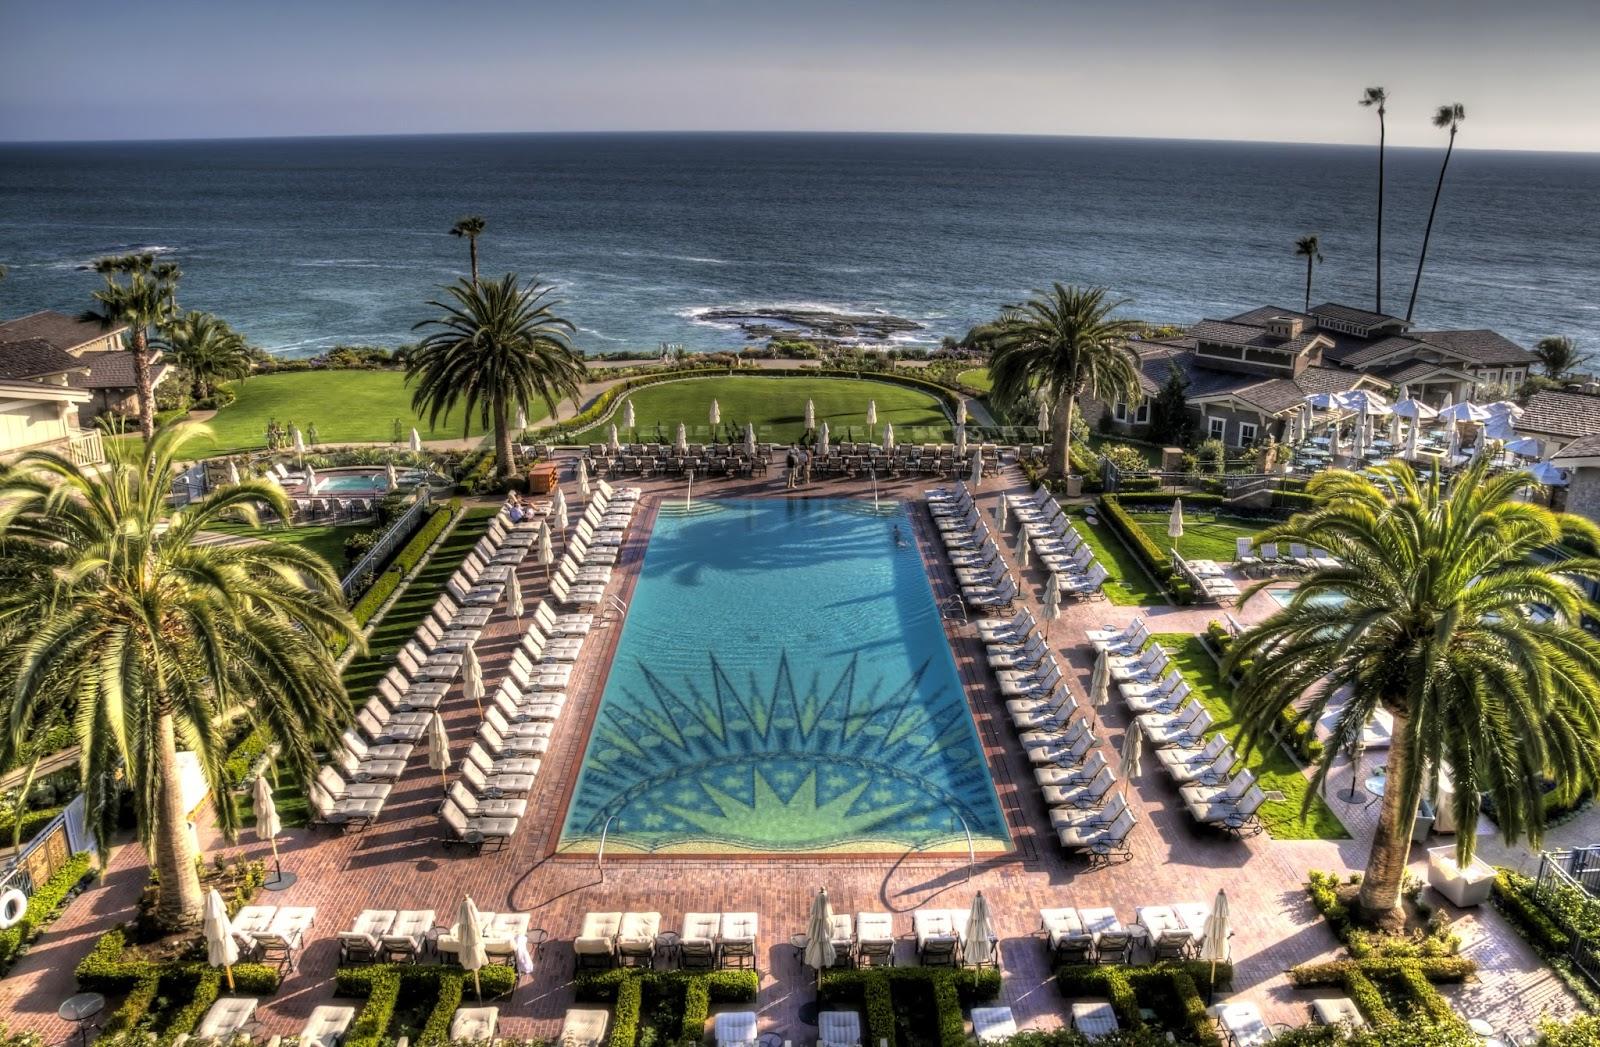 Luxury Hotels Montage Laguna Beach Offers